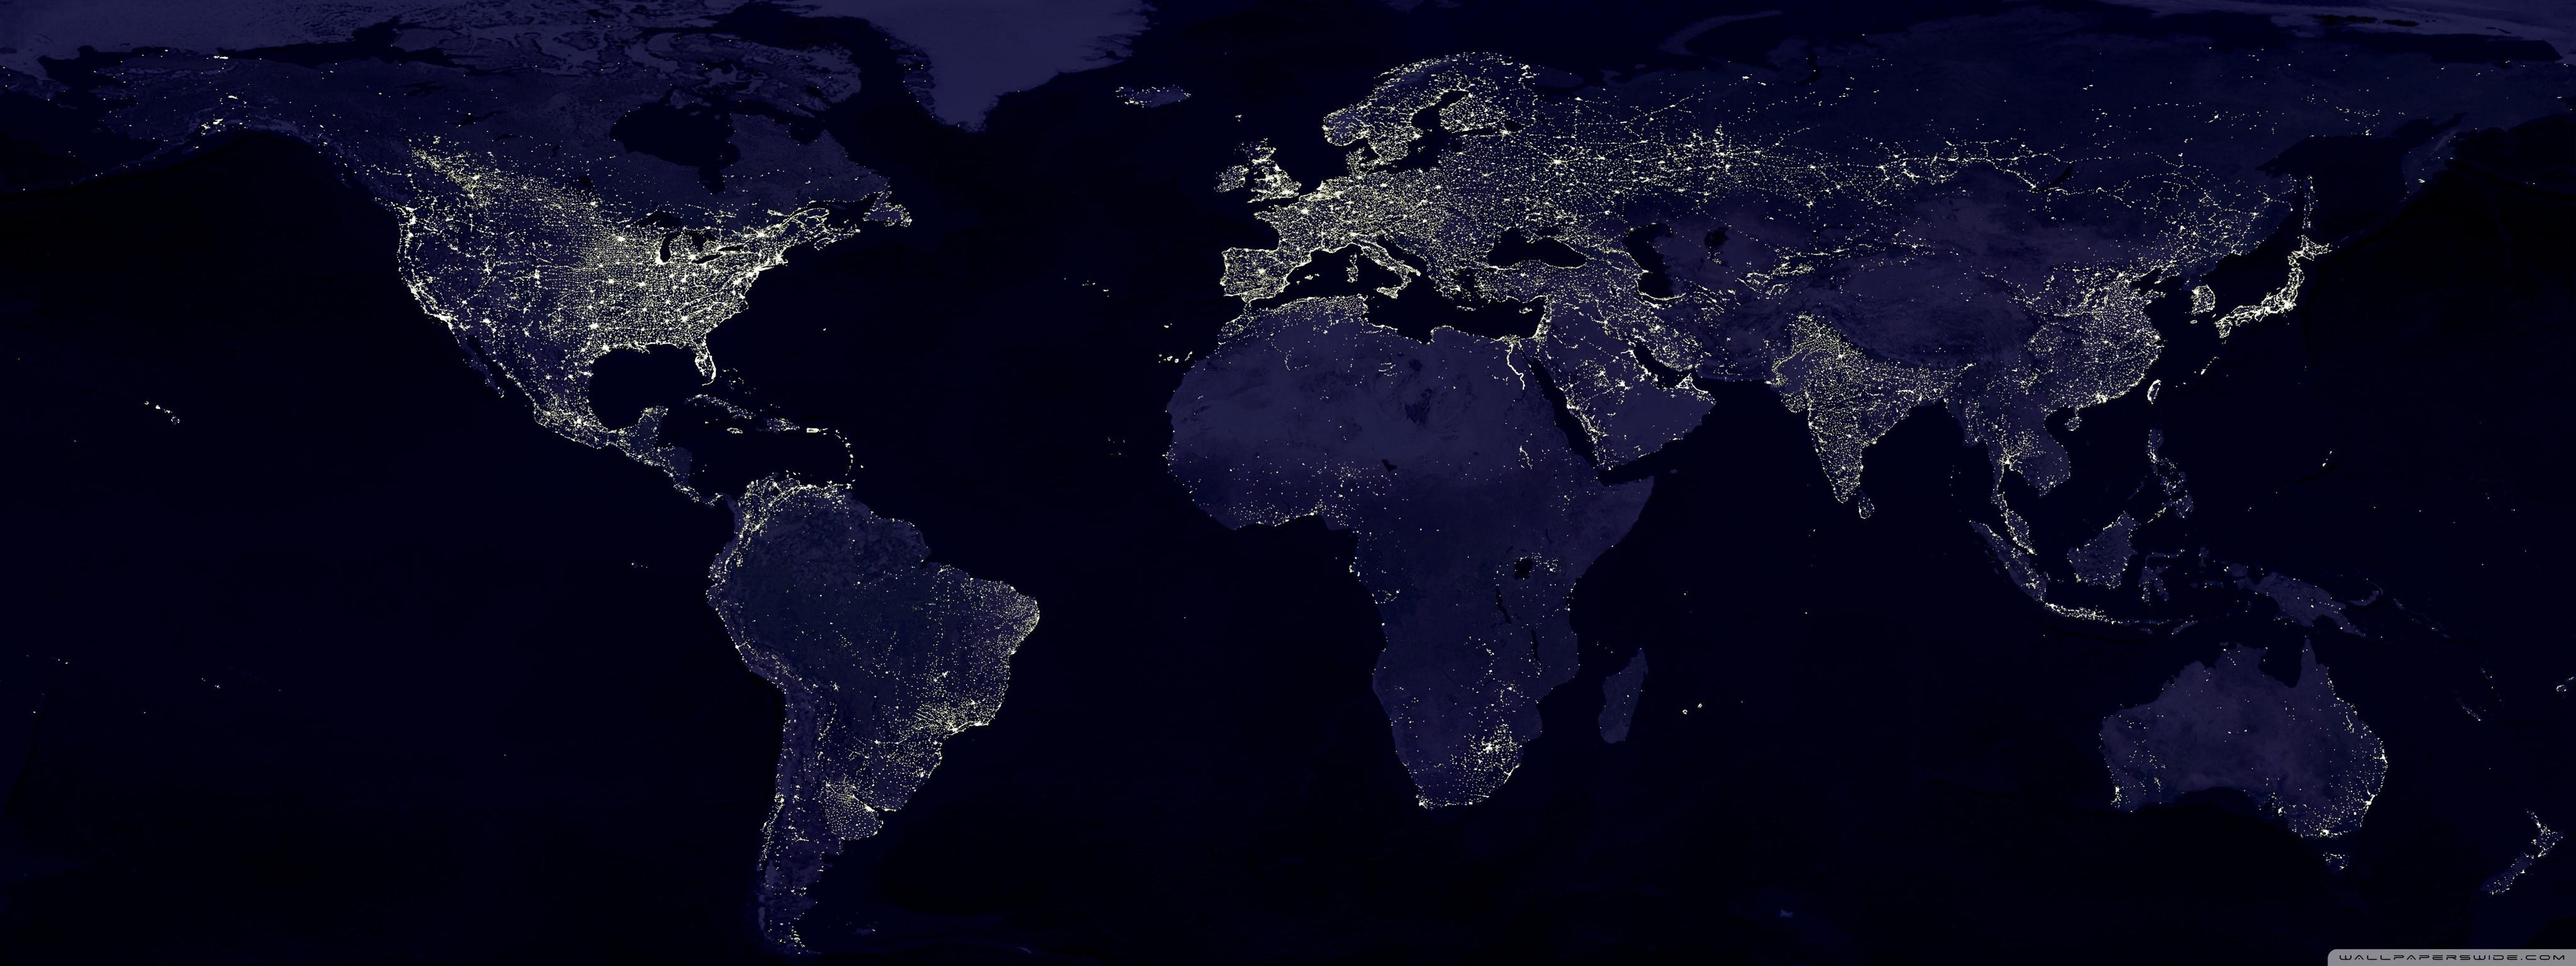 earth4096x1536.jpg